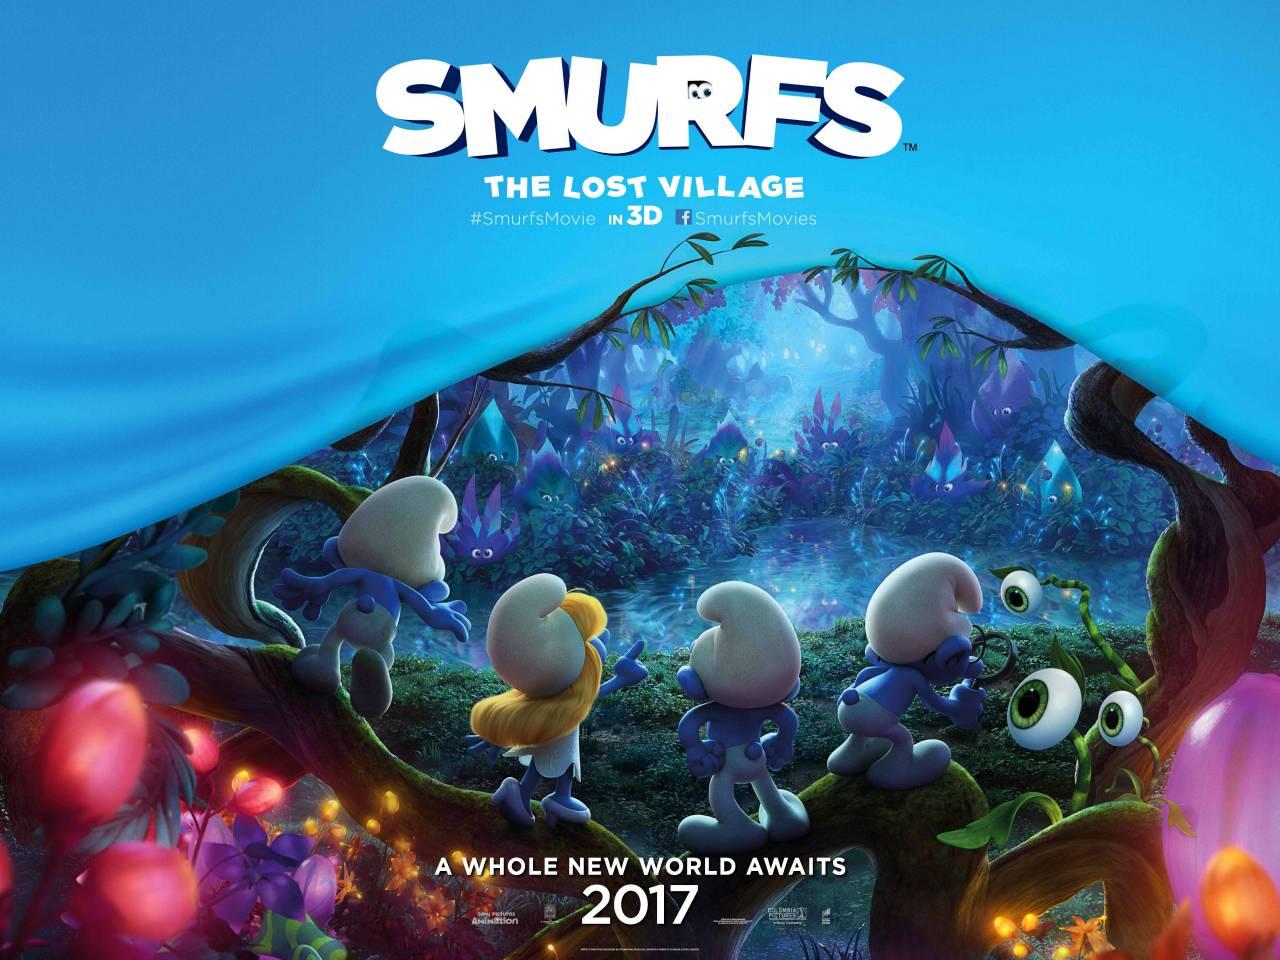 smurfs-lost-village-poster